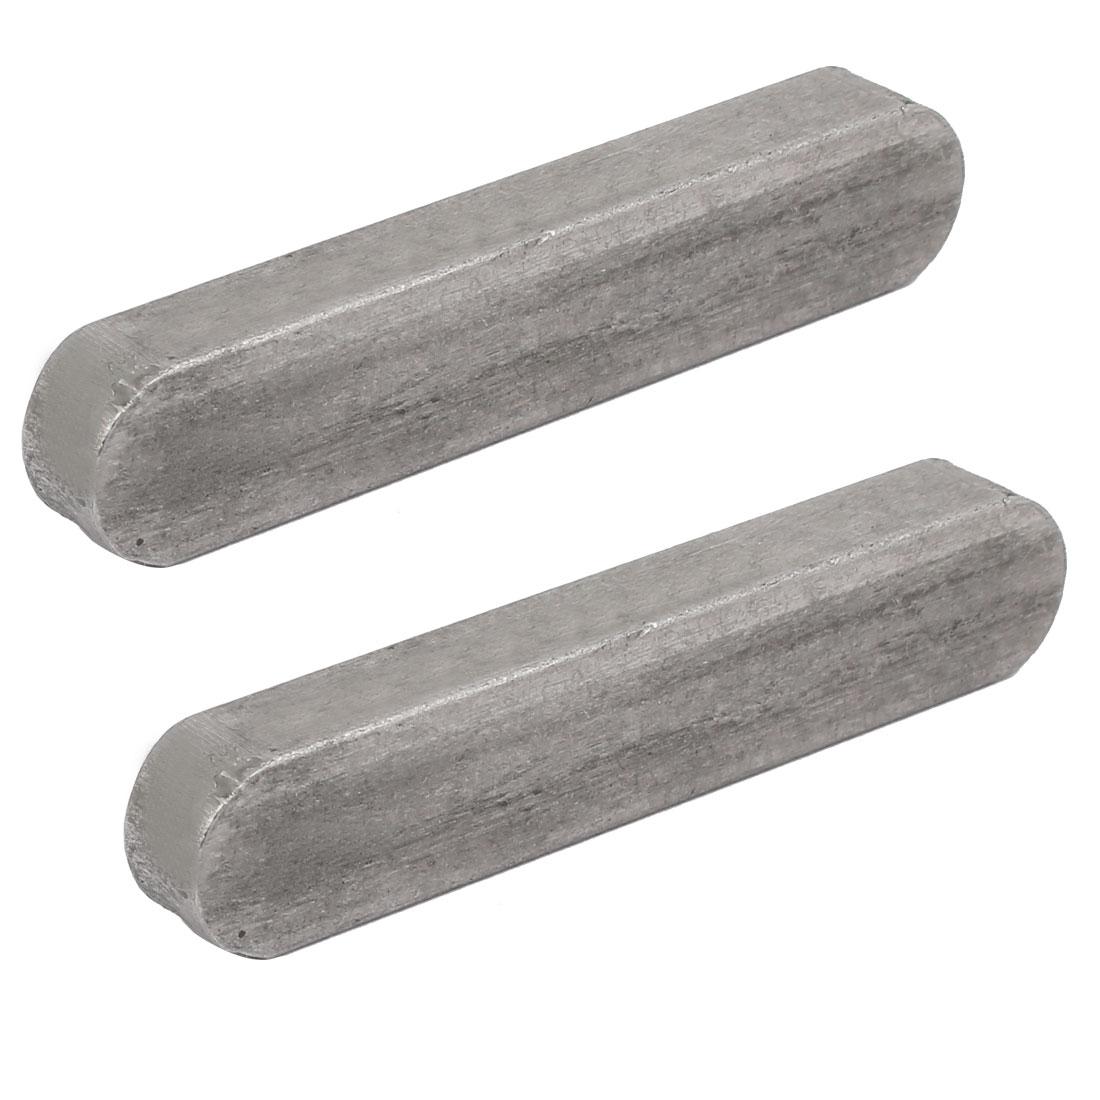 80mmx16mmx10mm Carbon Steel Key Stock To Lock Pulleys 2pcs